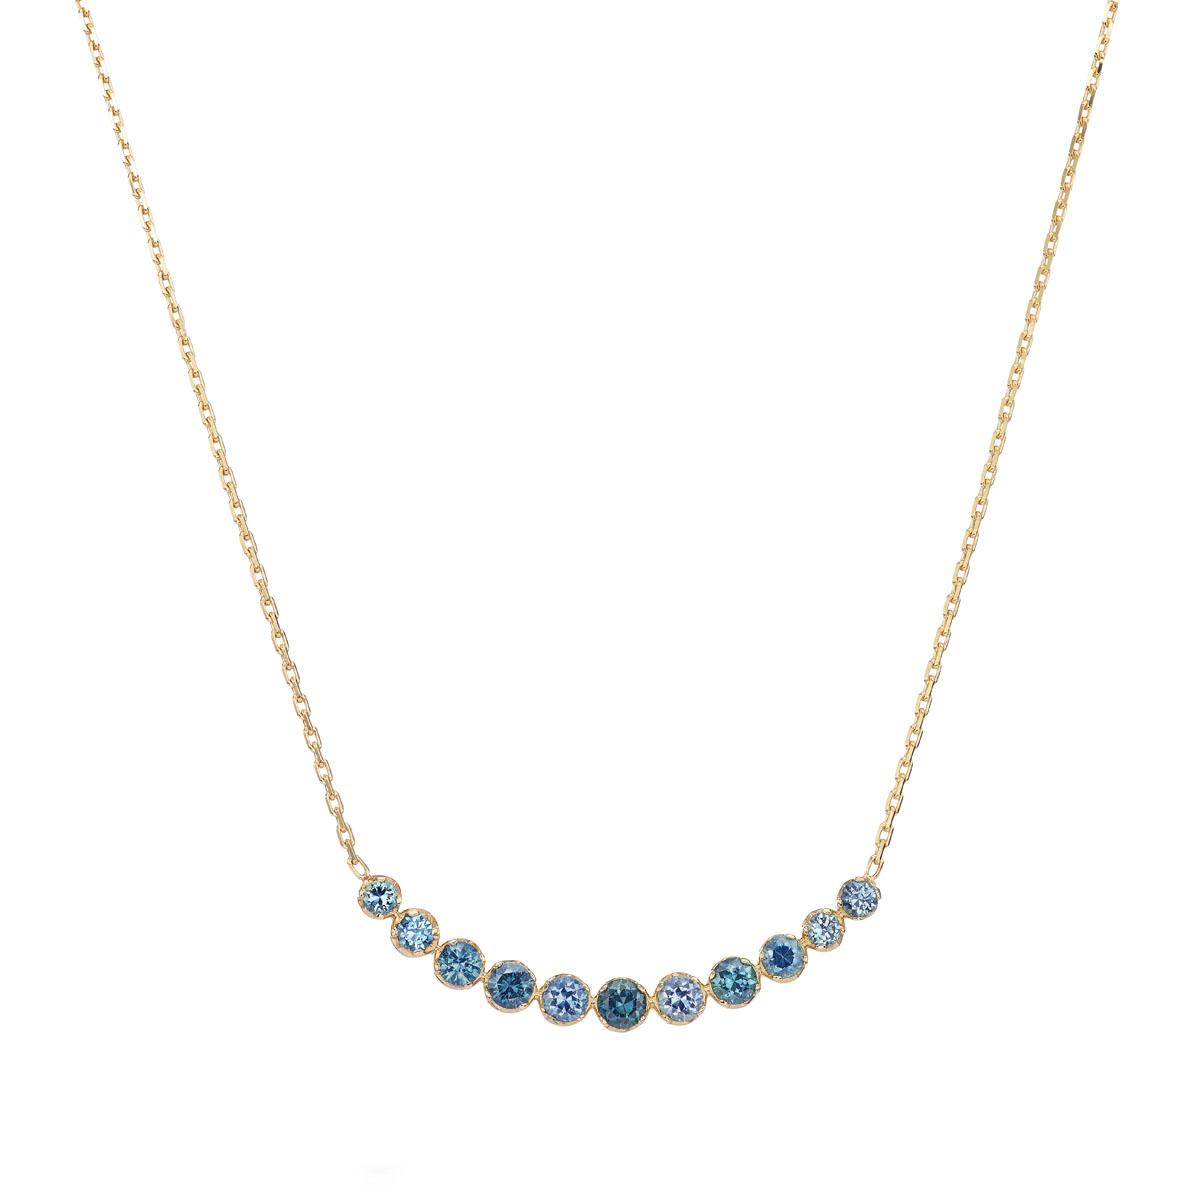 OT303-Sapphires_NoShadow_Sorellina.jpg